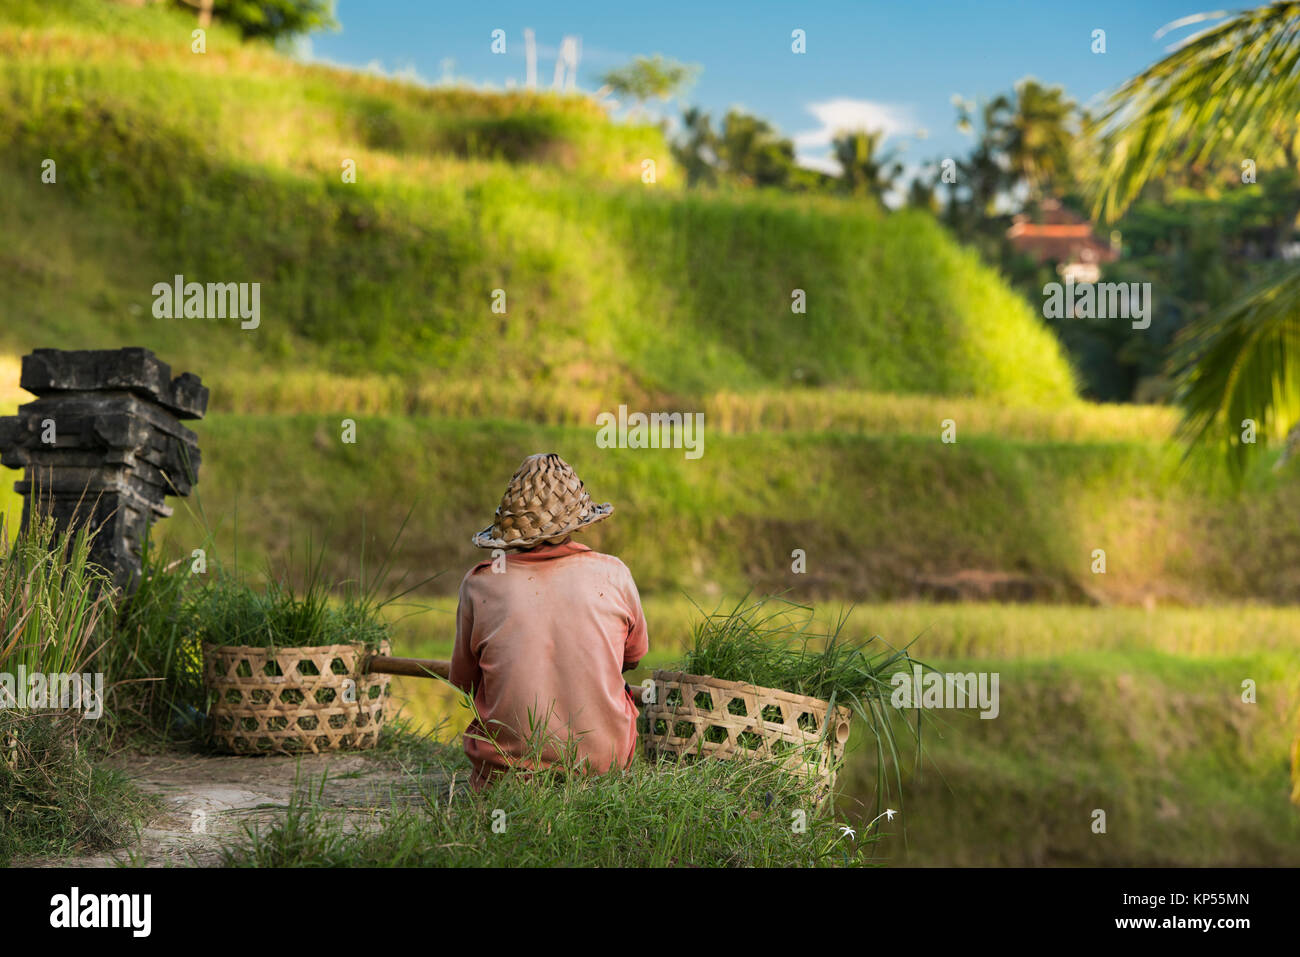 Tegallalang rice Terraces, Ubud, Bali, Indonesia - Stock Image